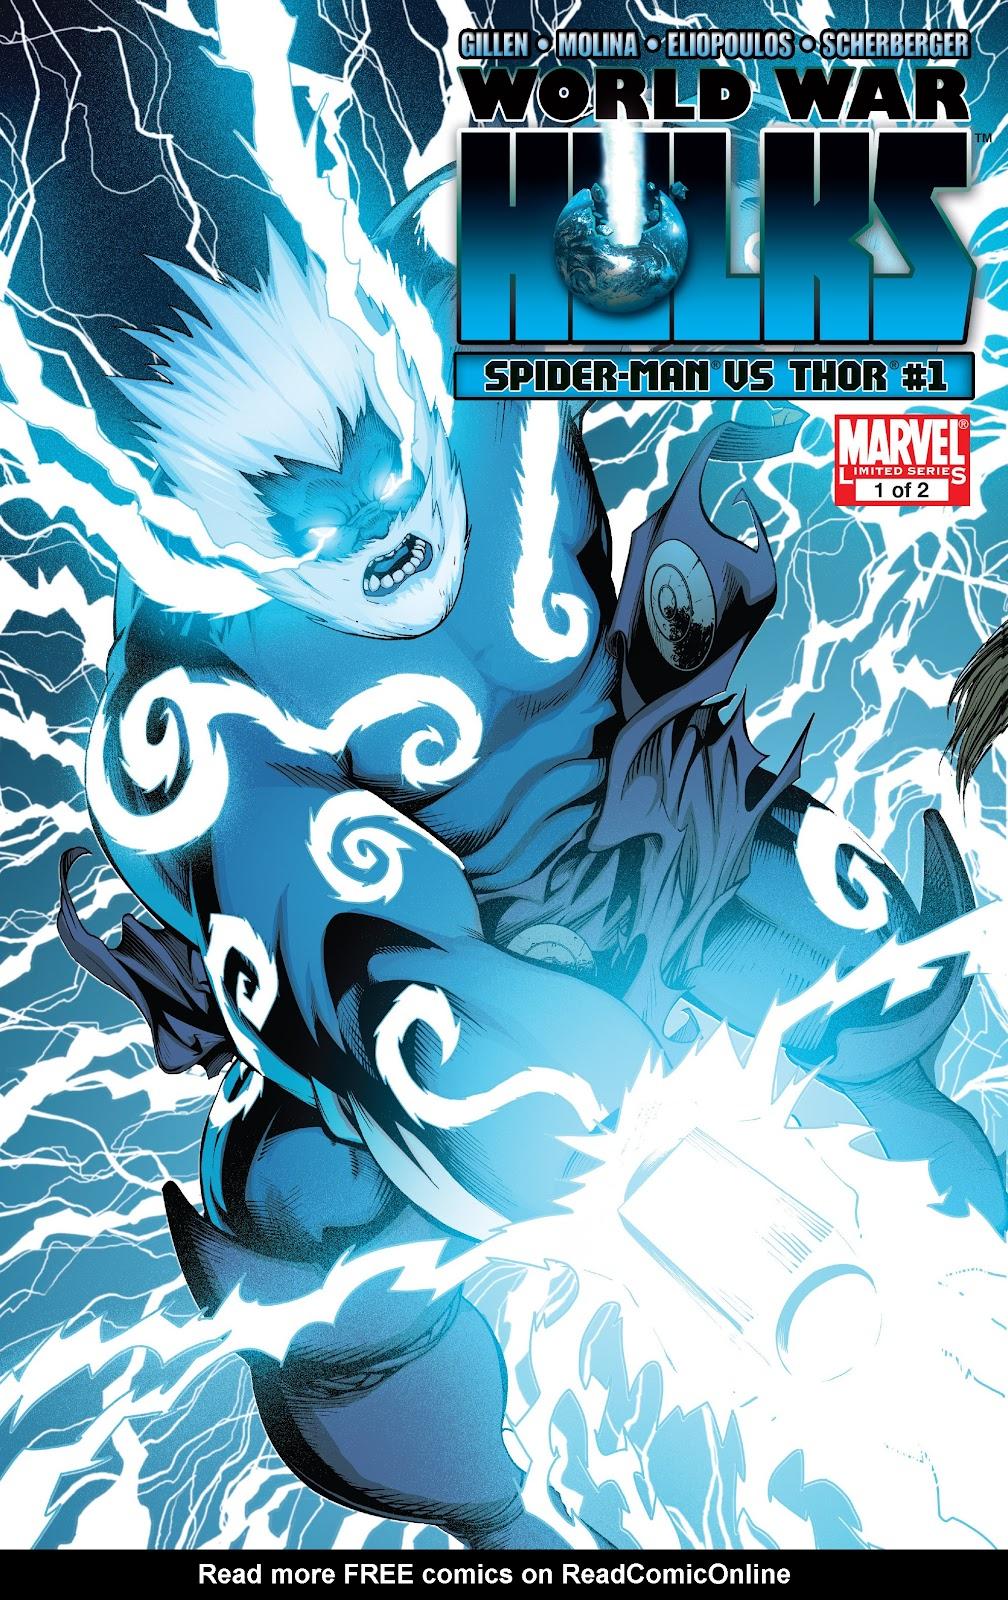 World War Hulks: Spider-Man vs. Thor Issue #1 #1 - English 1